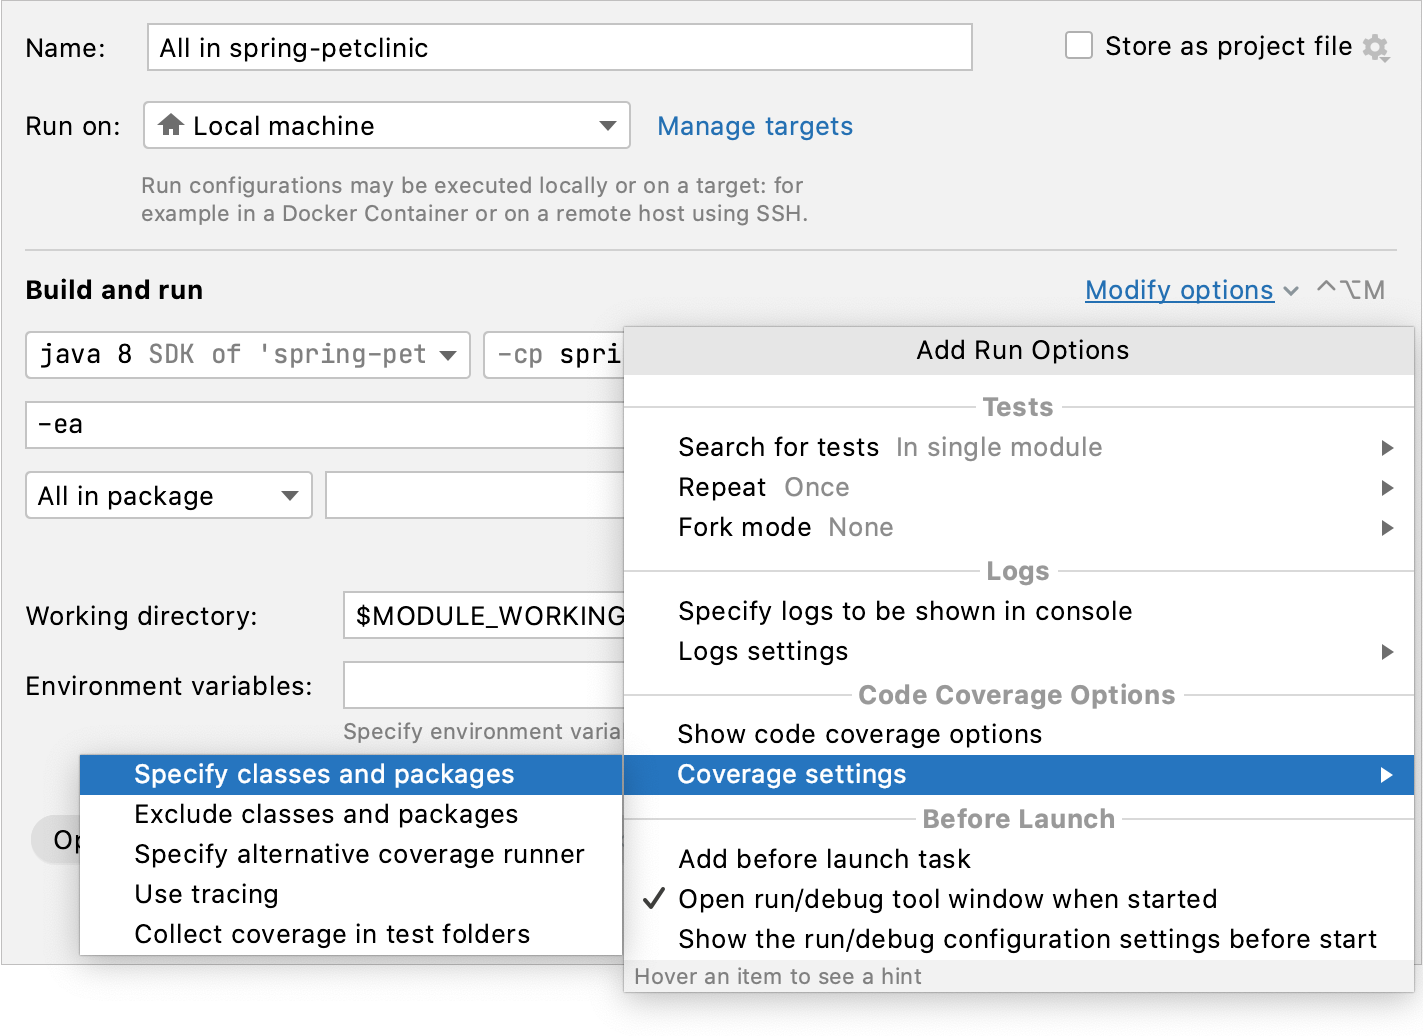 Code Coverage in the Run/debug Configuration dialog